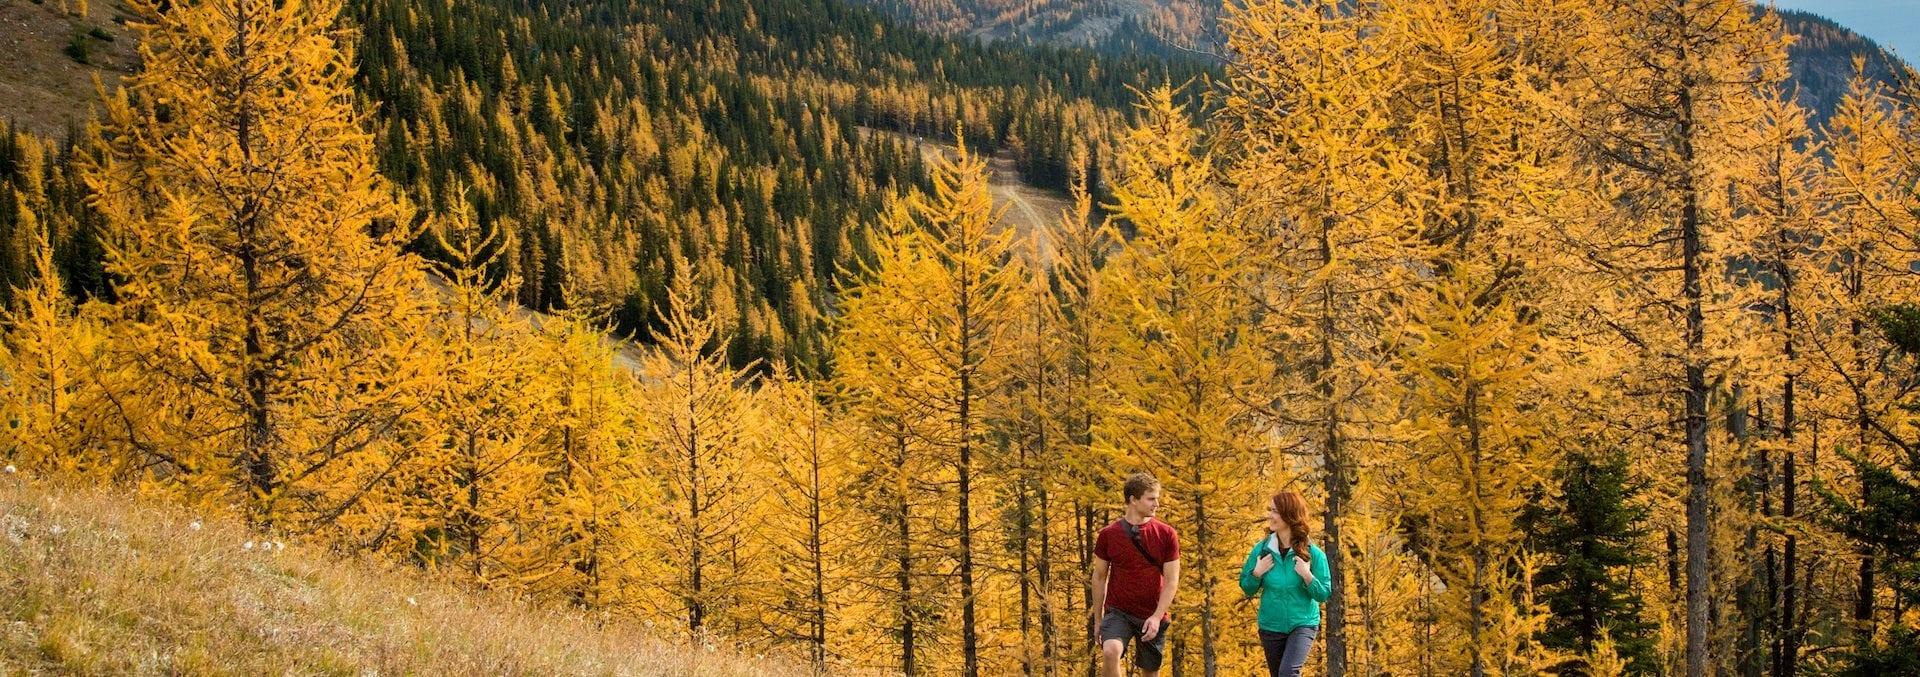 Banff Wildlife Tours Reviews